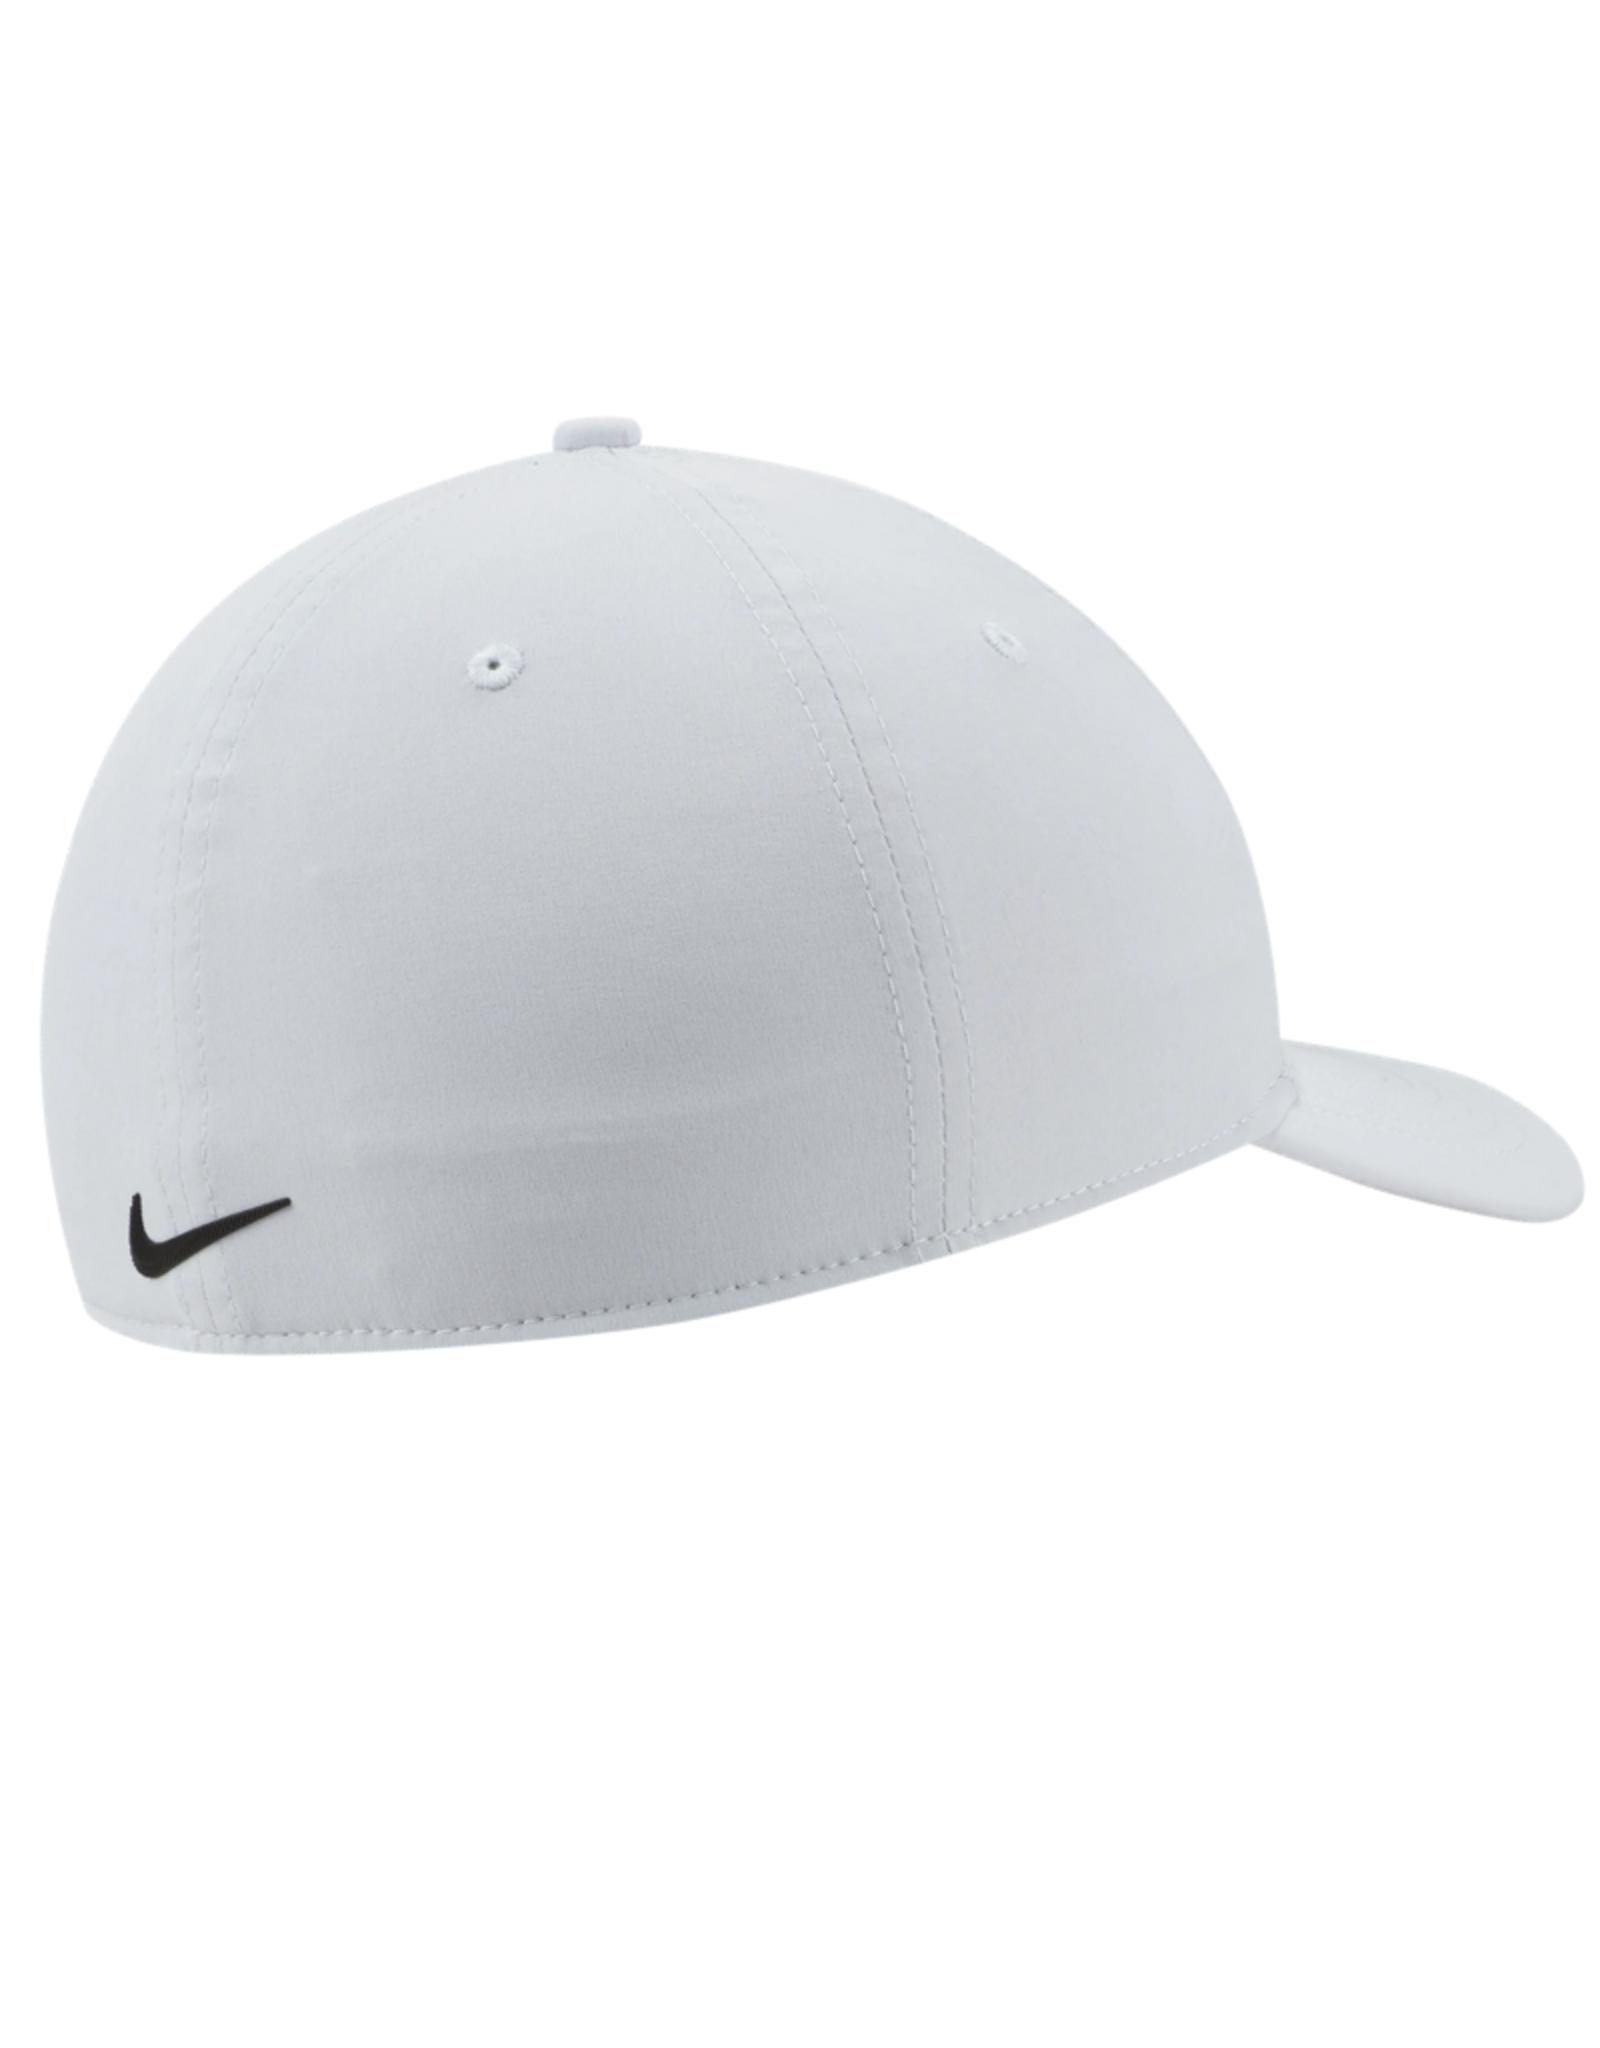 Nike Men's Heritage 86 Hat Tiger Woods